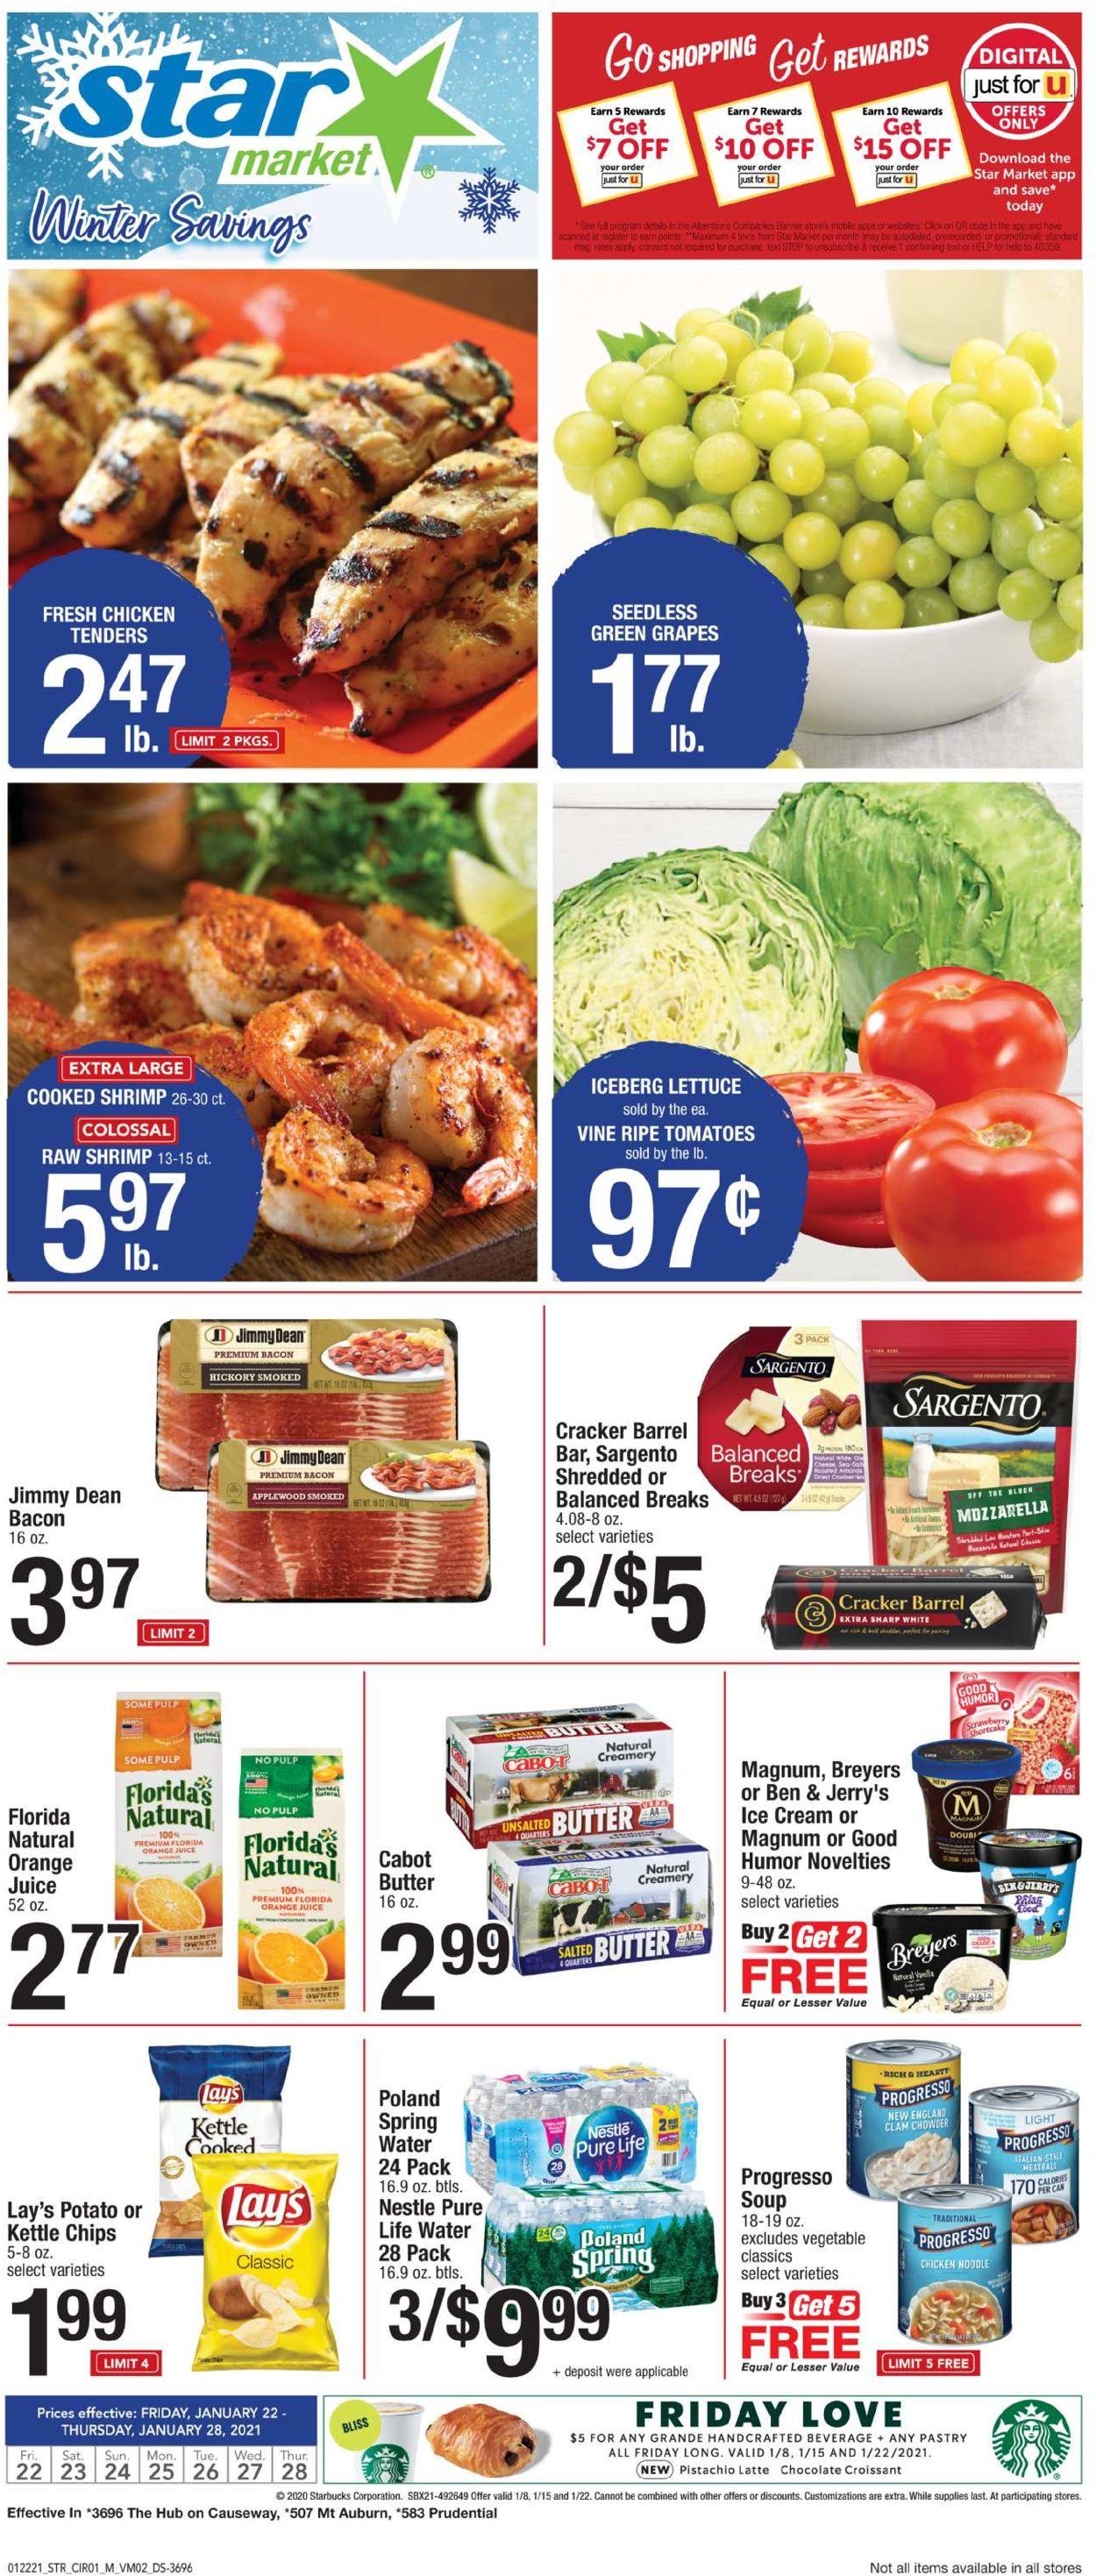 Star Market Weekly Ad Circular - valid 01/22-01/28/2021